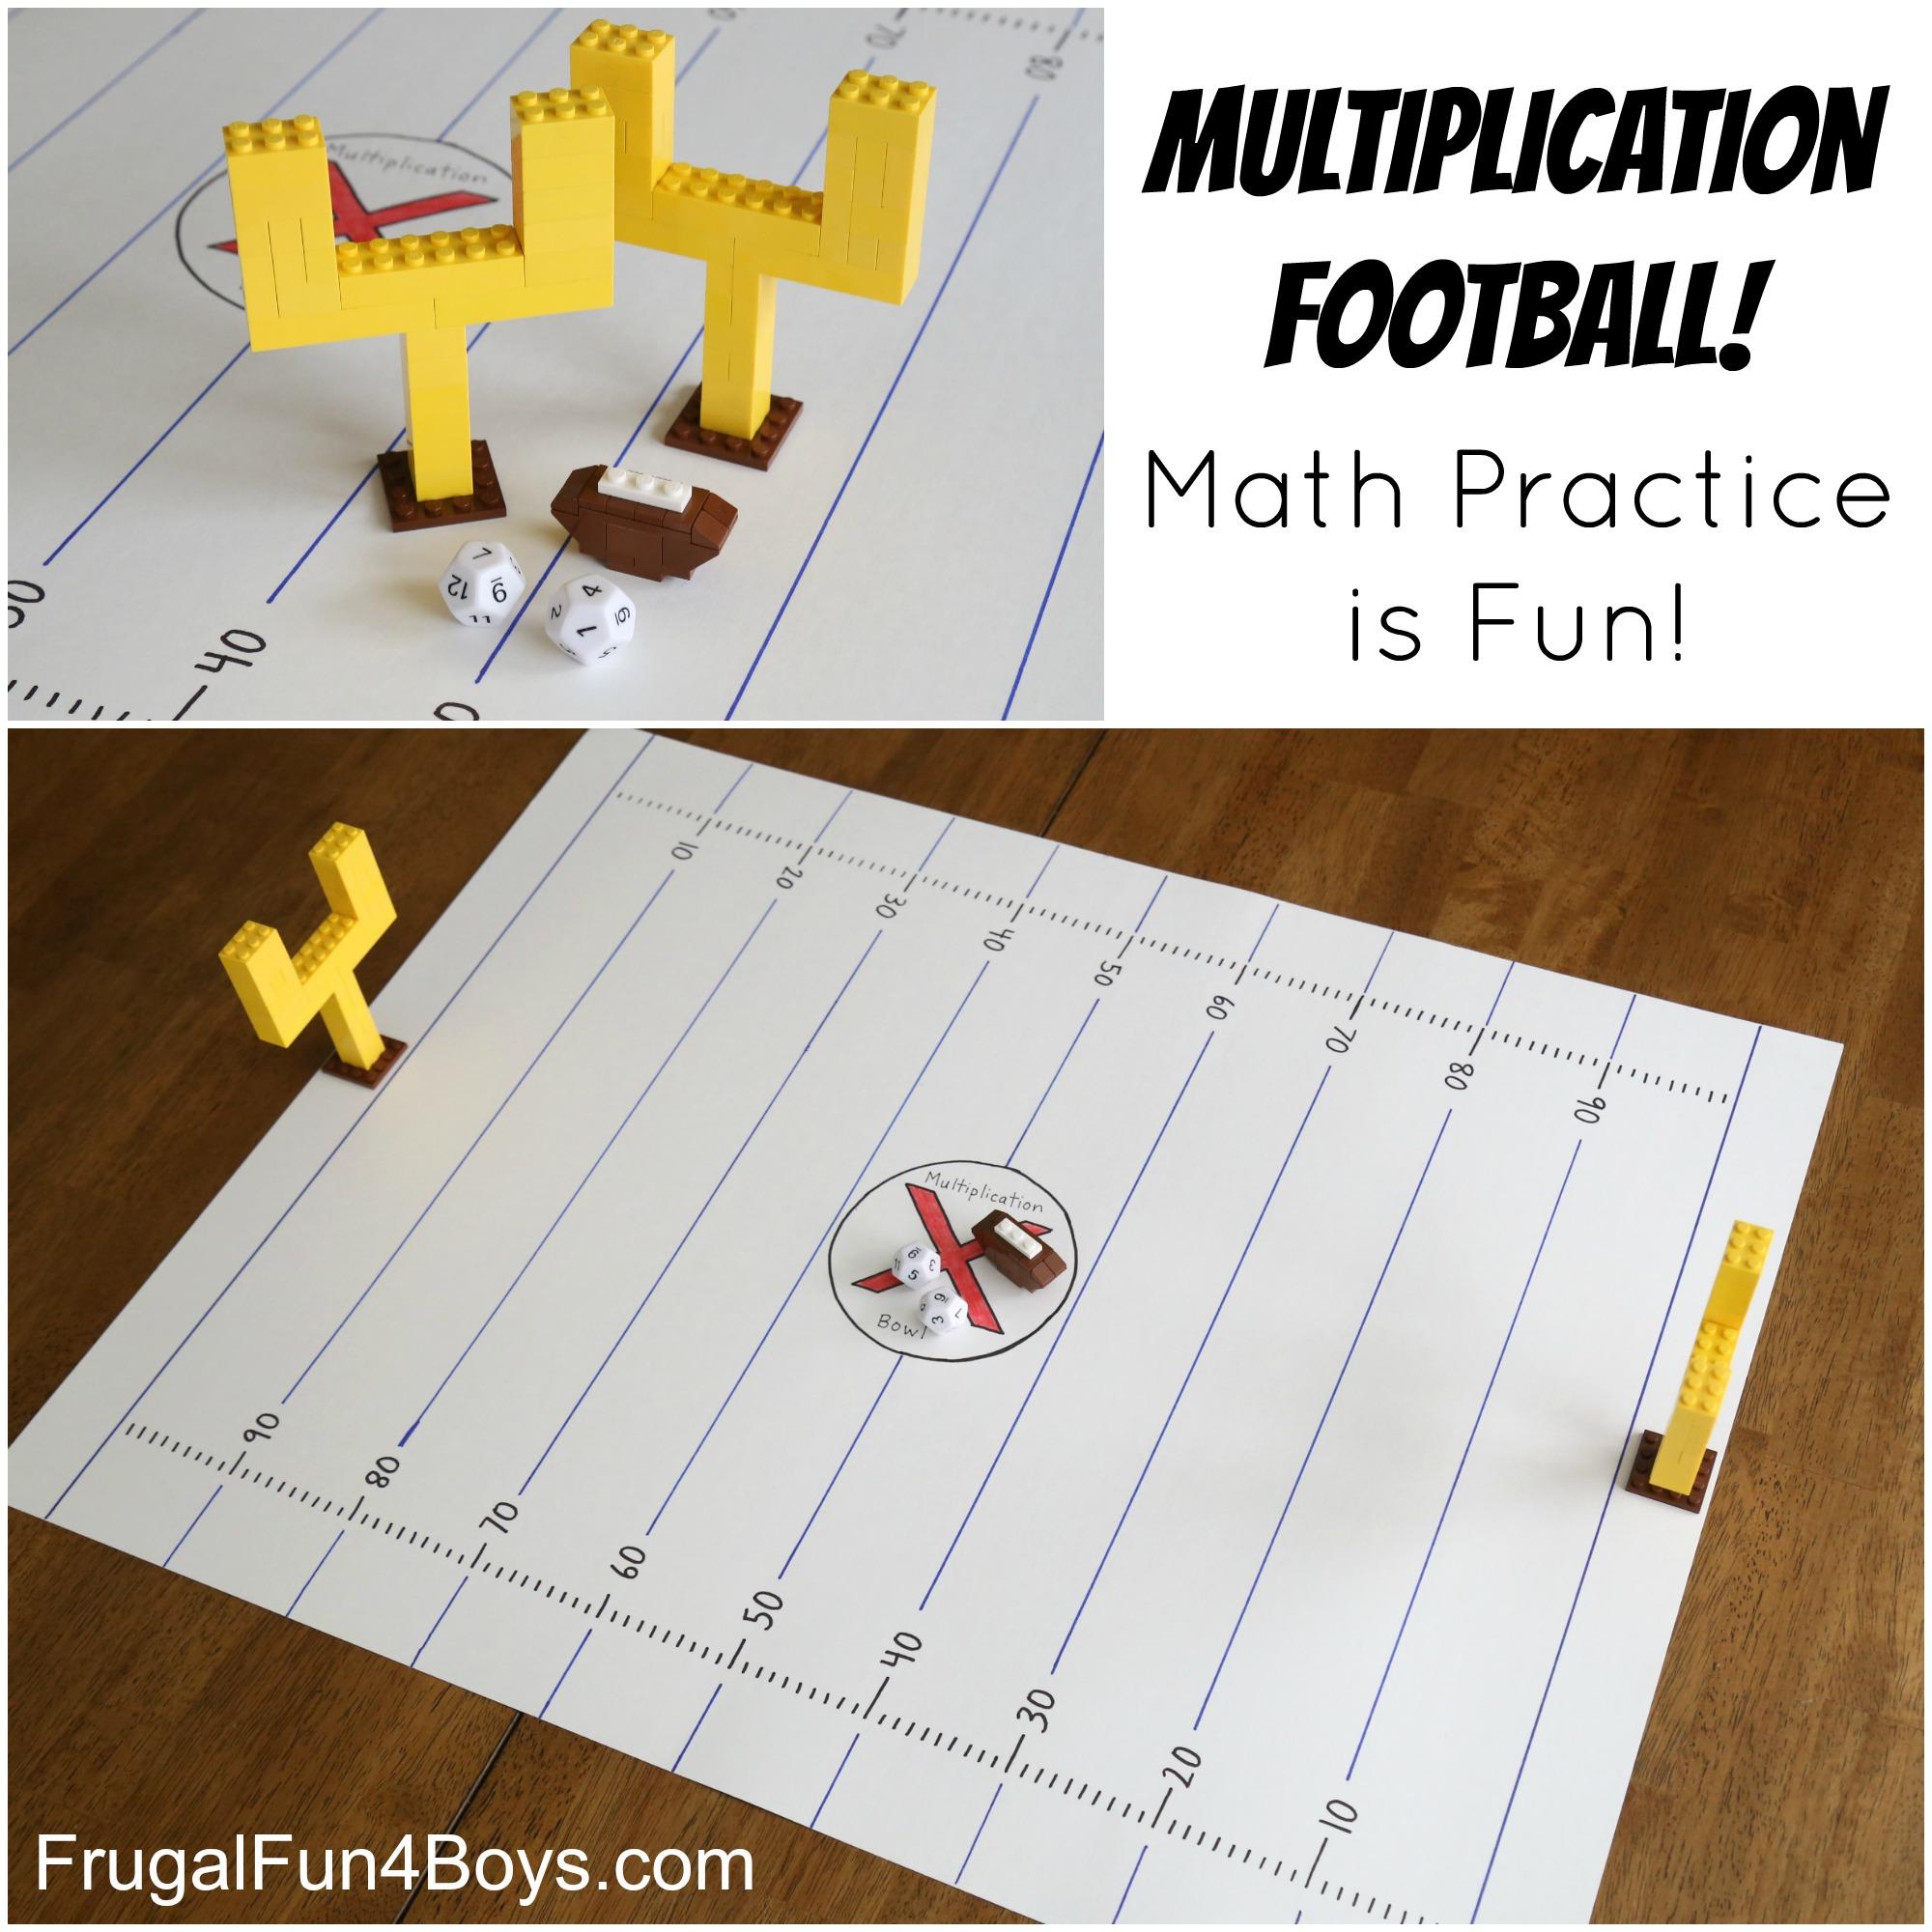 Multiplication Football Math Game for Kids!